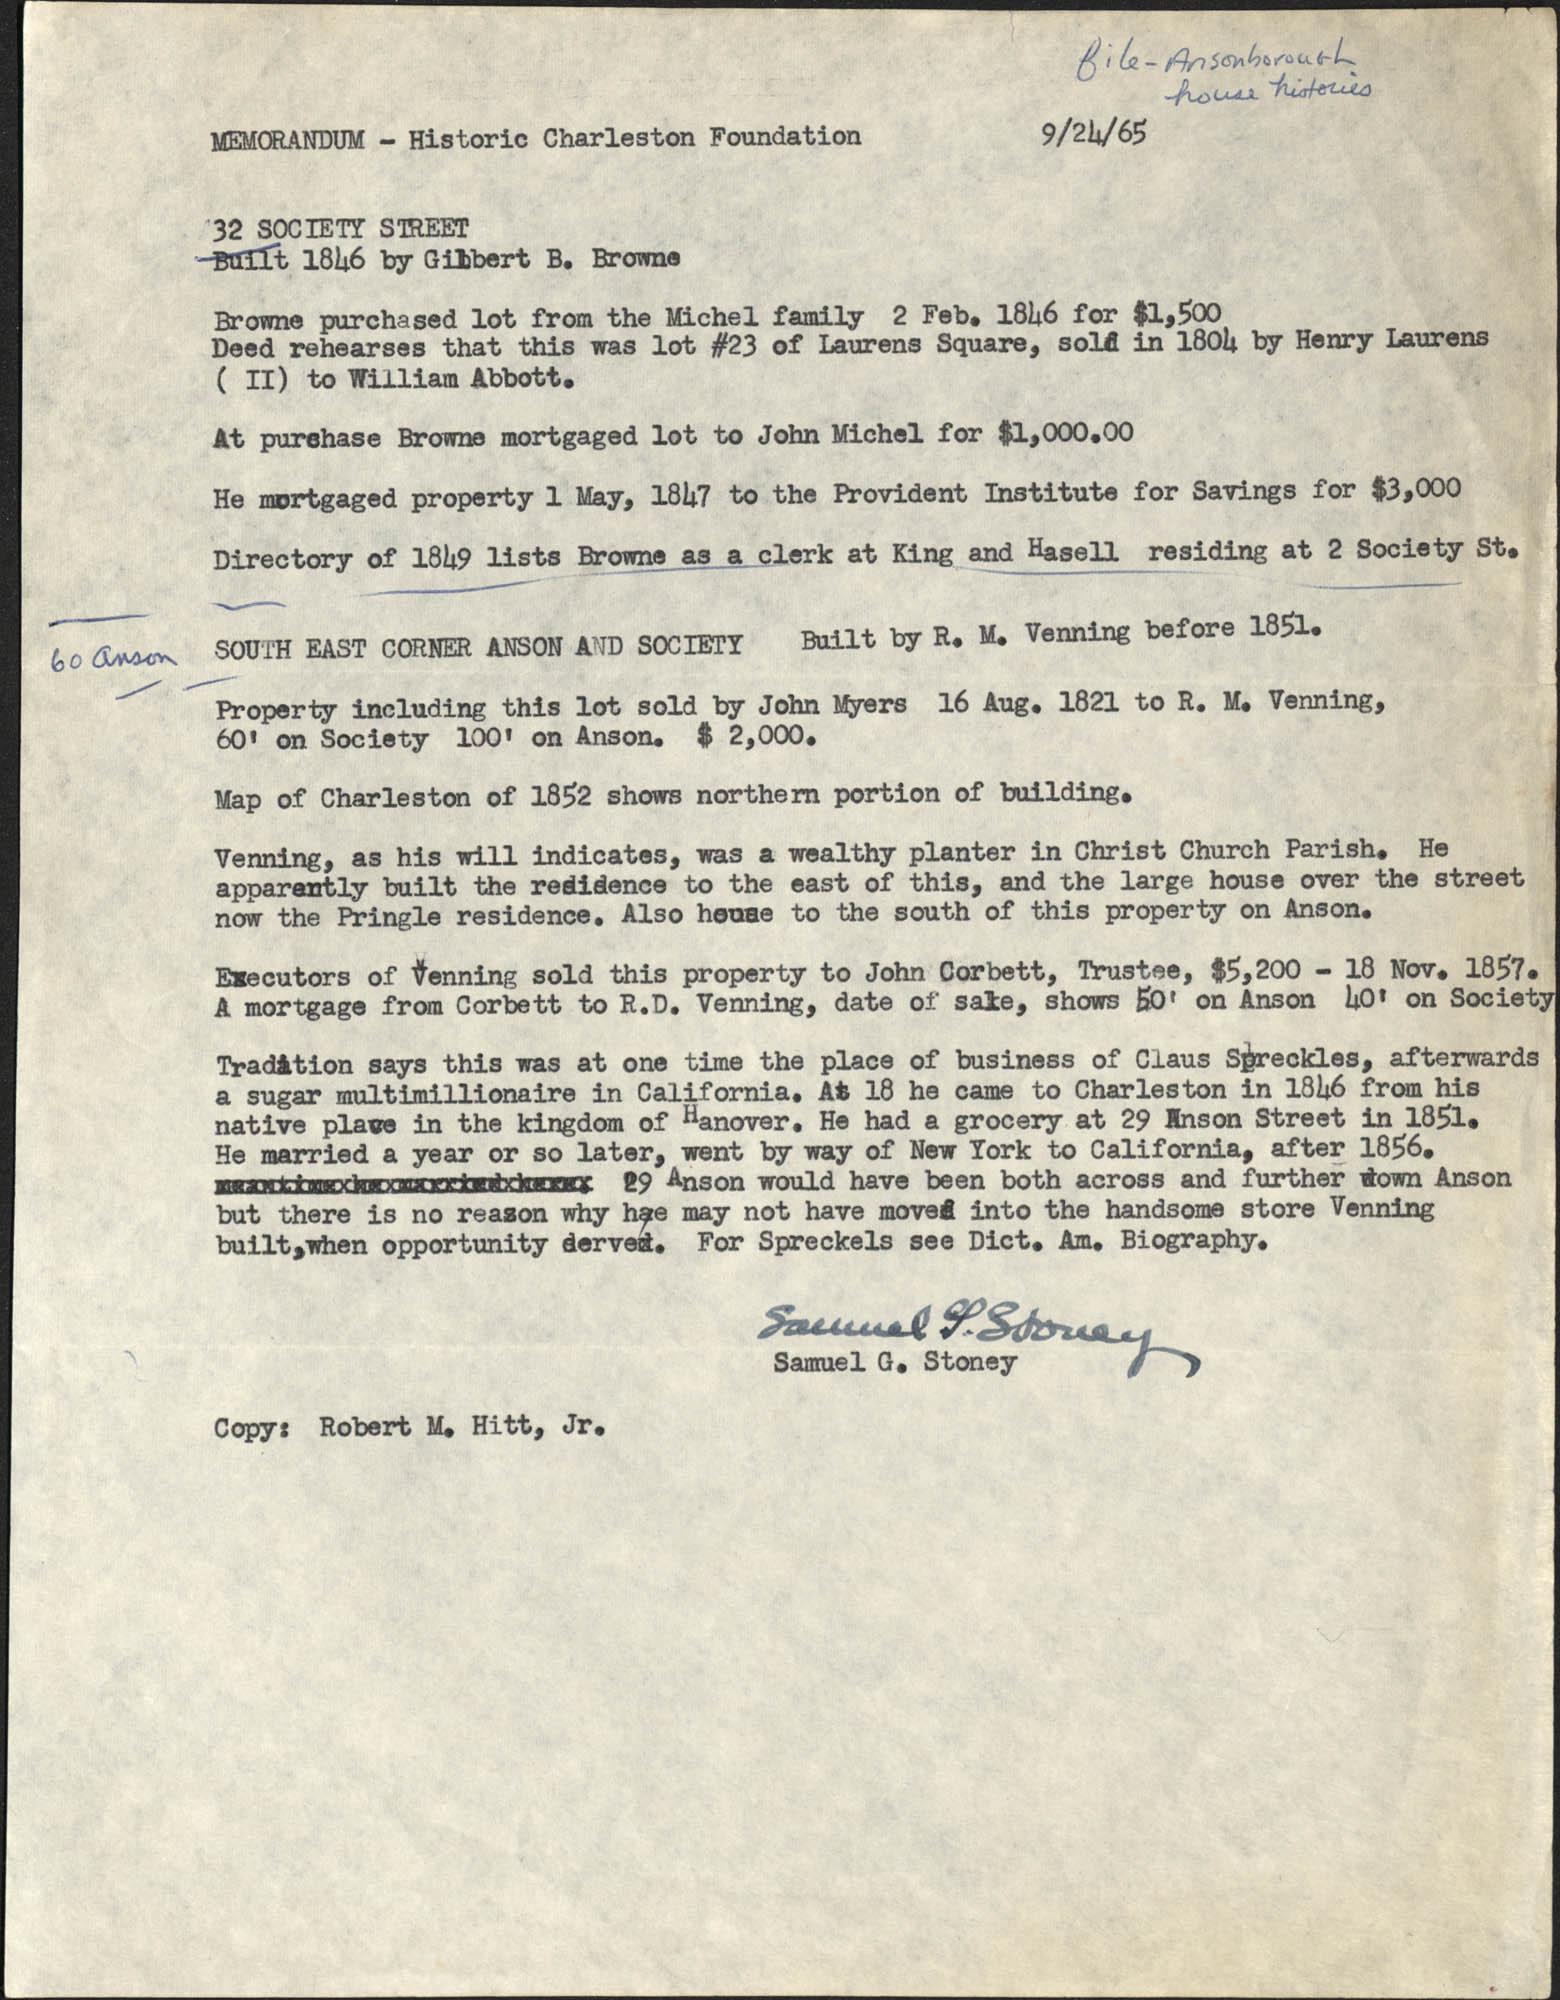 Memorandum from Samuel G. Stoney to Historic Charleston Foundation